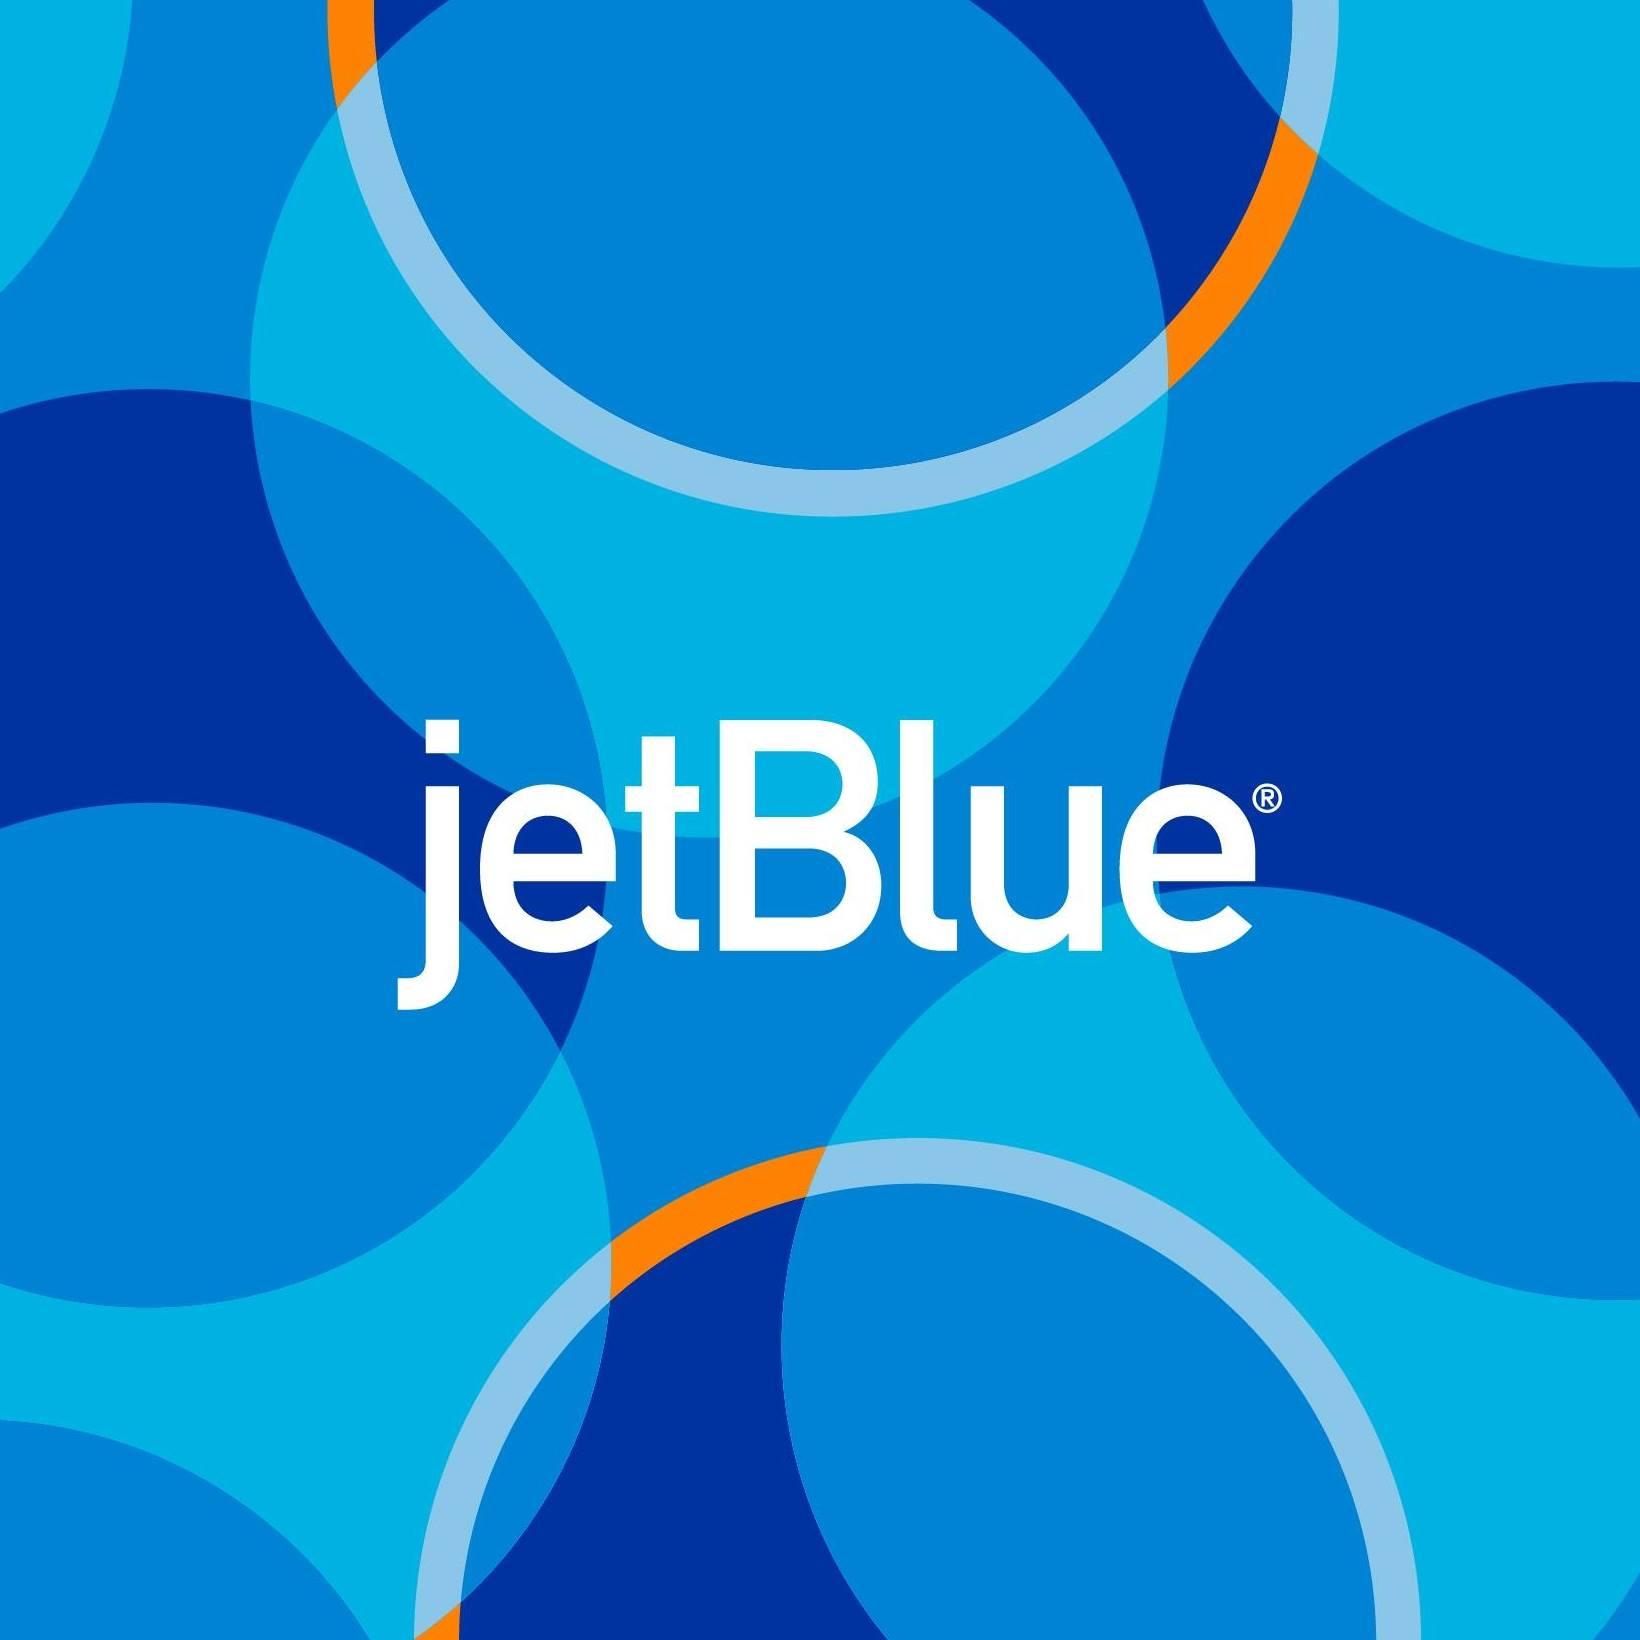 Heathrow/Gatwick to JFK £329 return (Flying Aug - Sep) with JetBlue